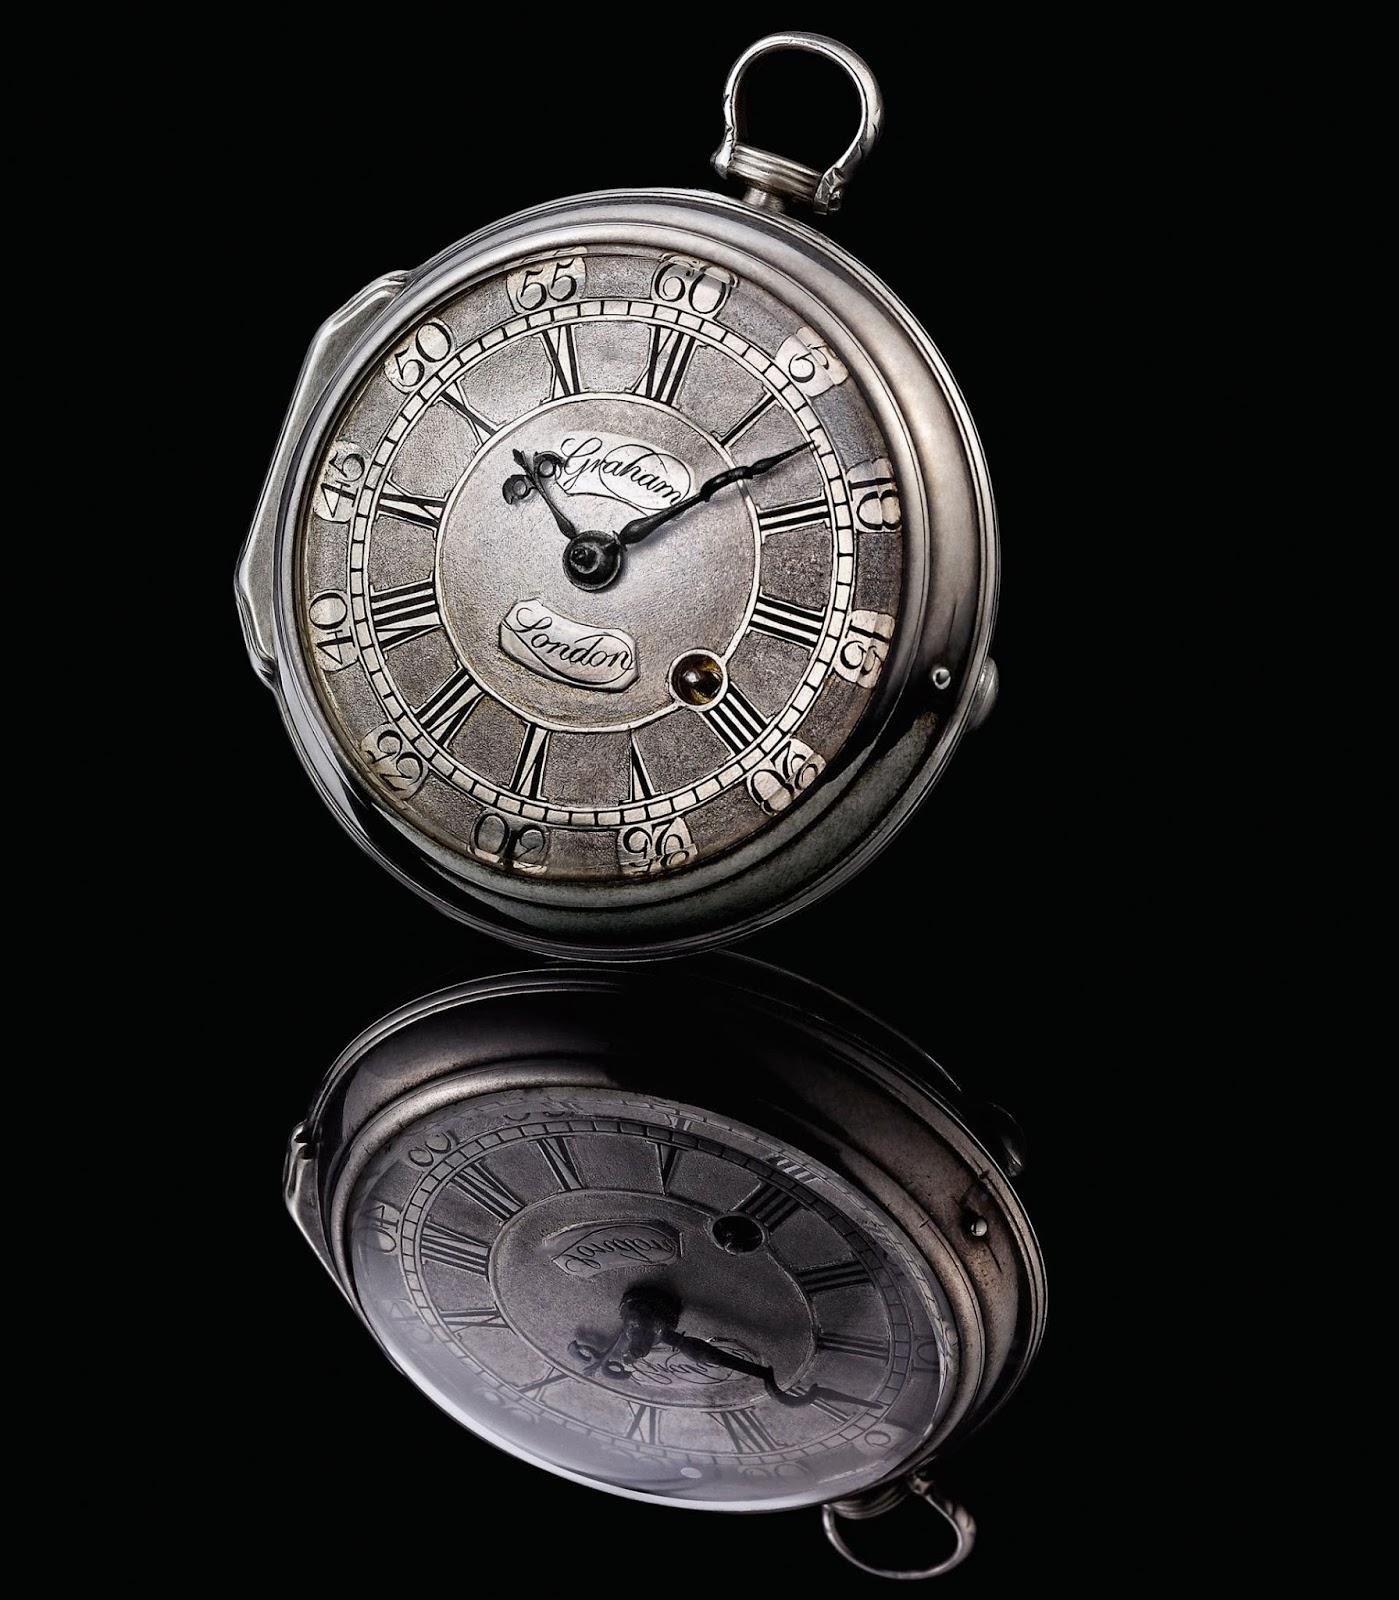 Original pocket watch by George Graham, circa mid-1720s